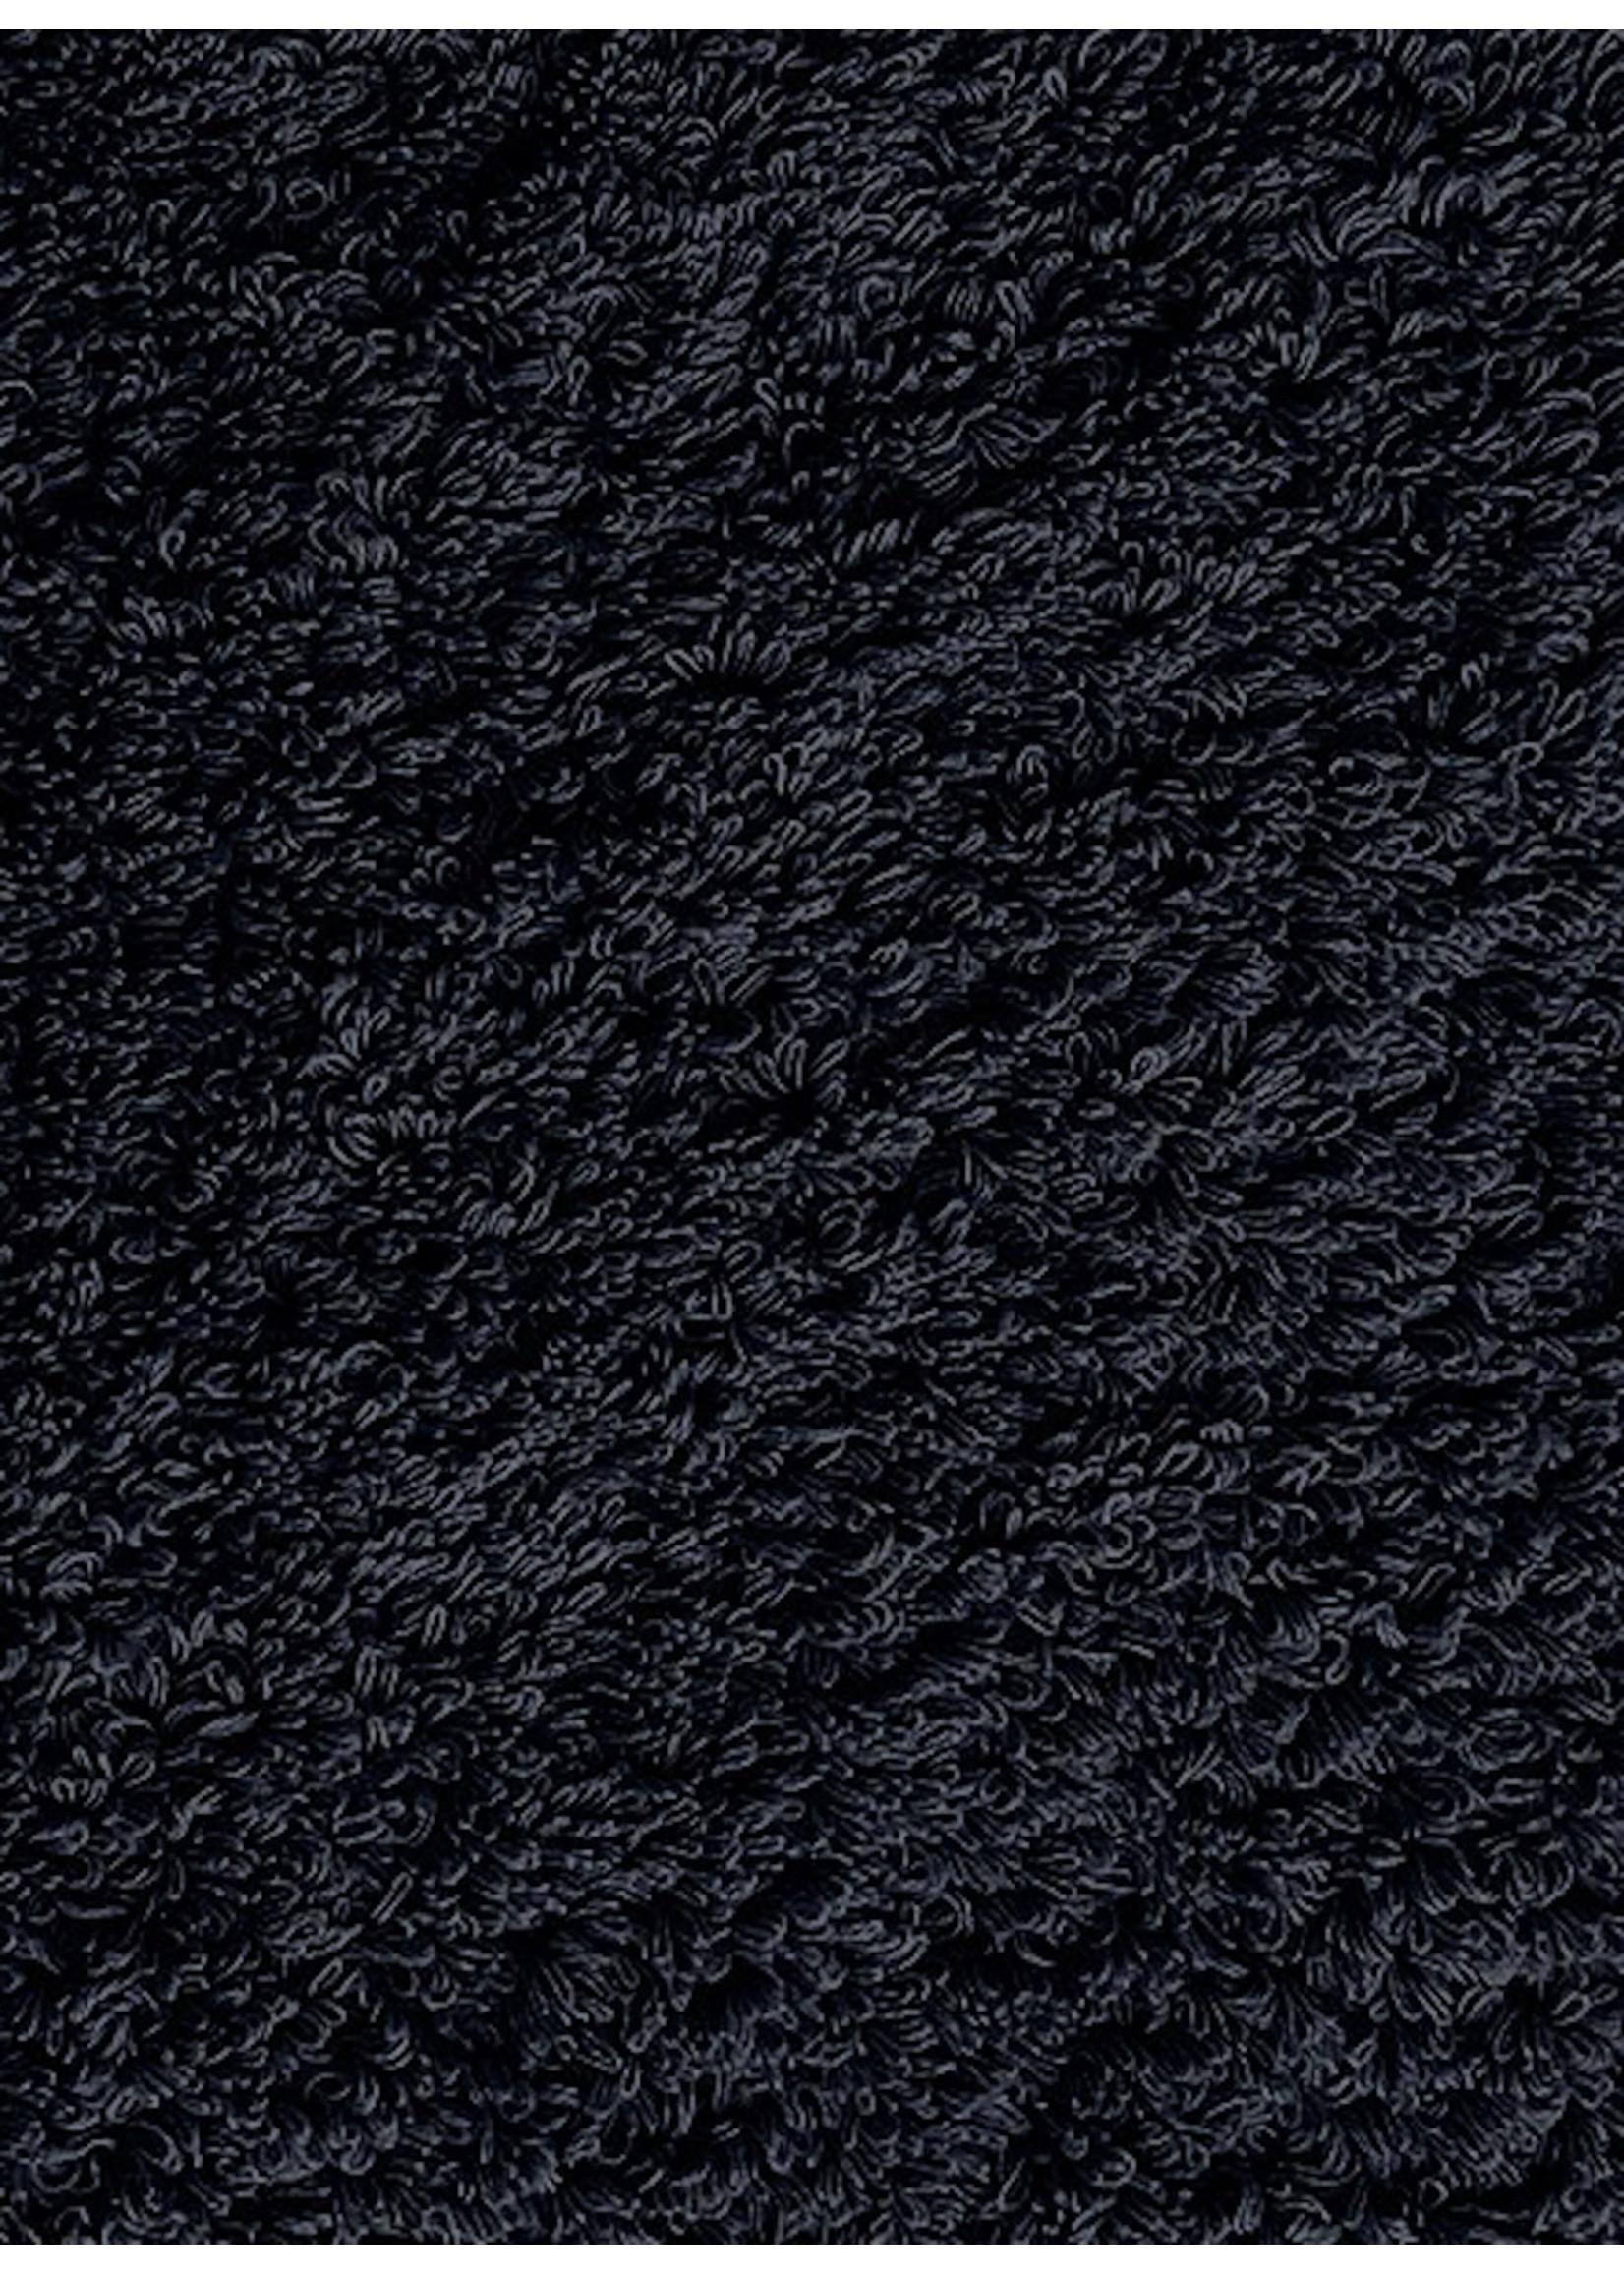 Abyss & Habidecor Super Pile Black Towels